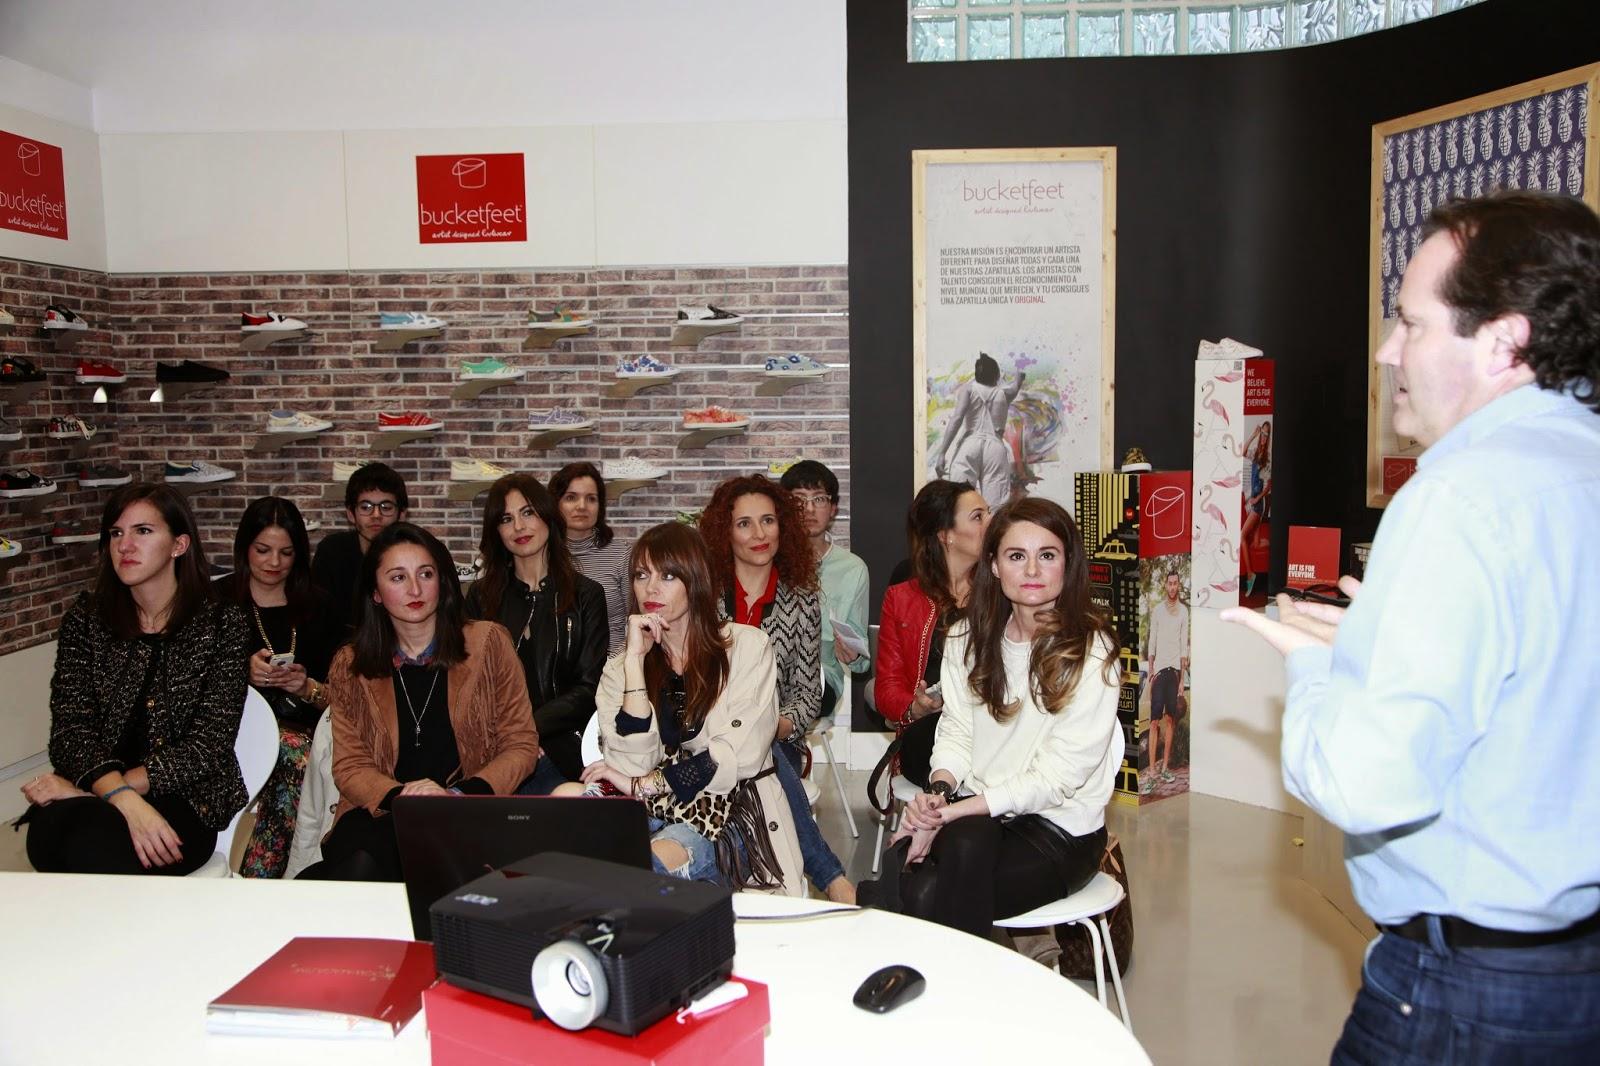 bloggers bucketfeet